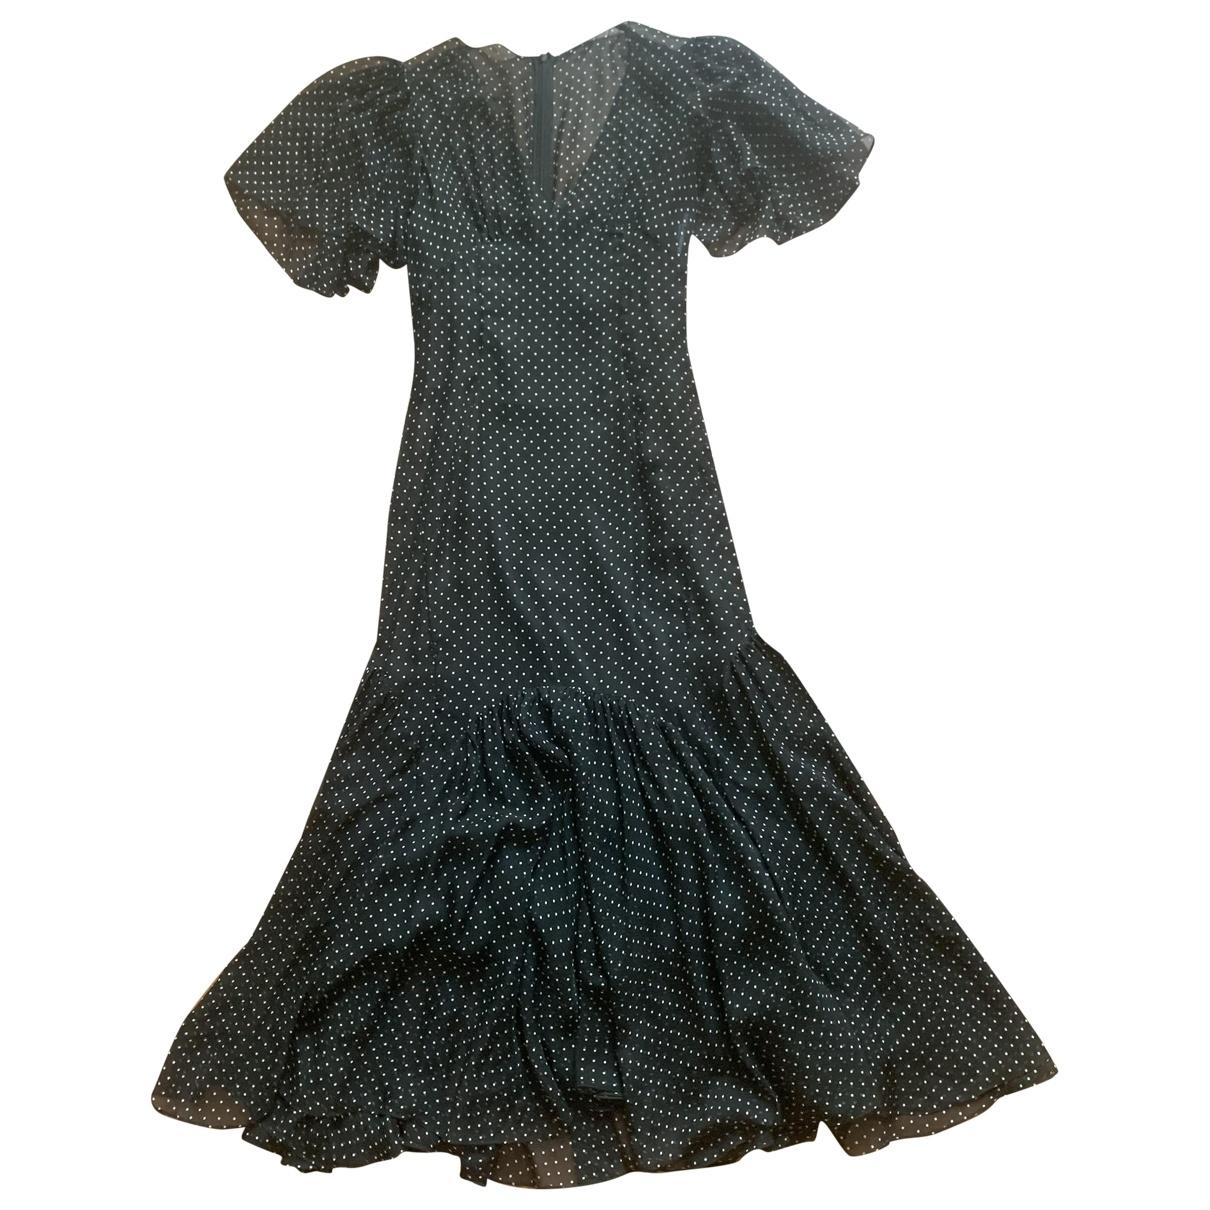 Dolce & Gabbana \N Kleid in  Grau Seide